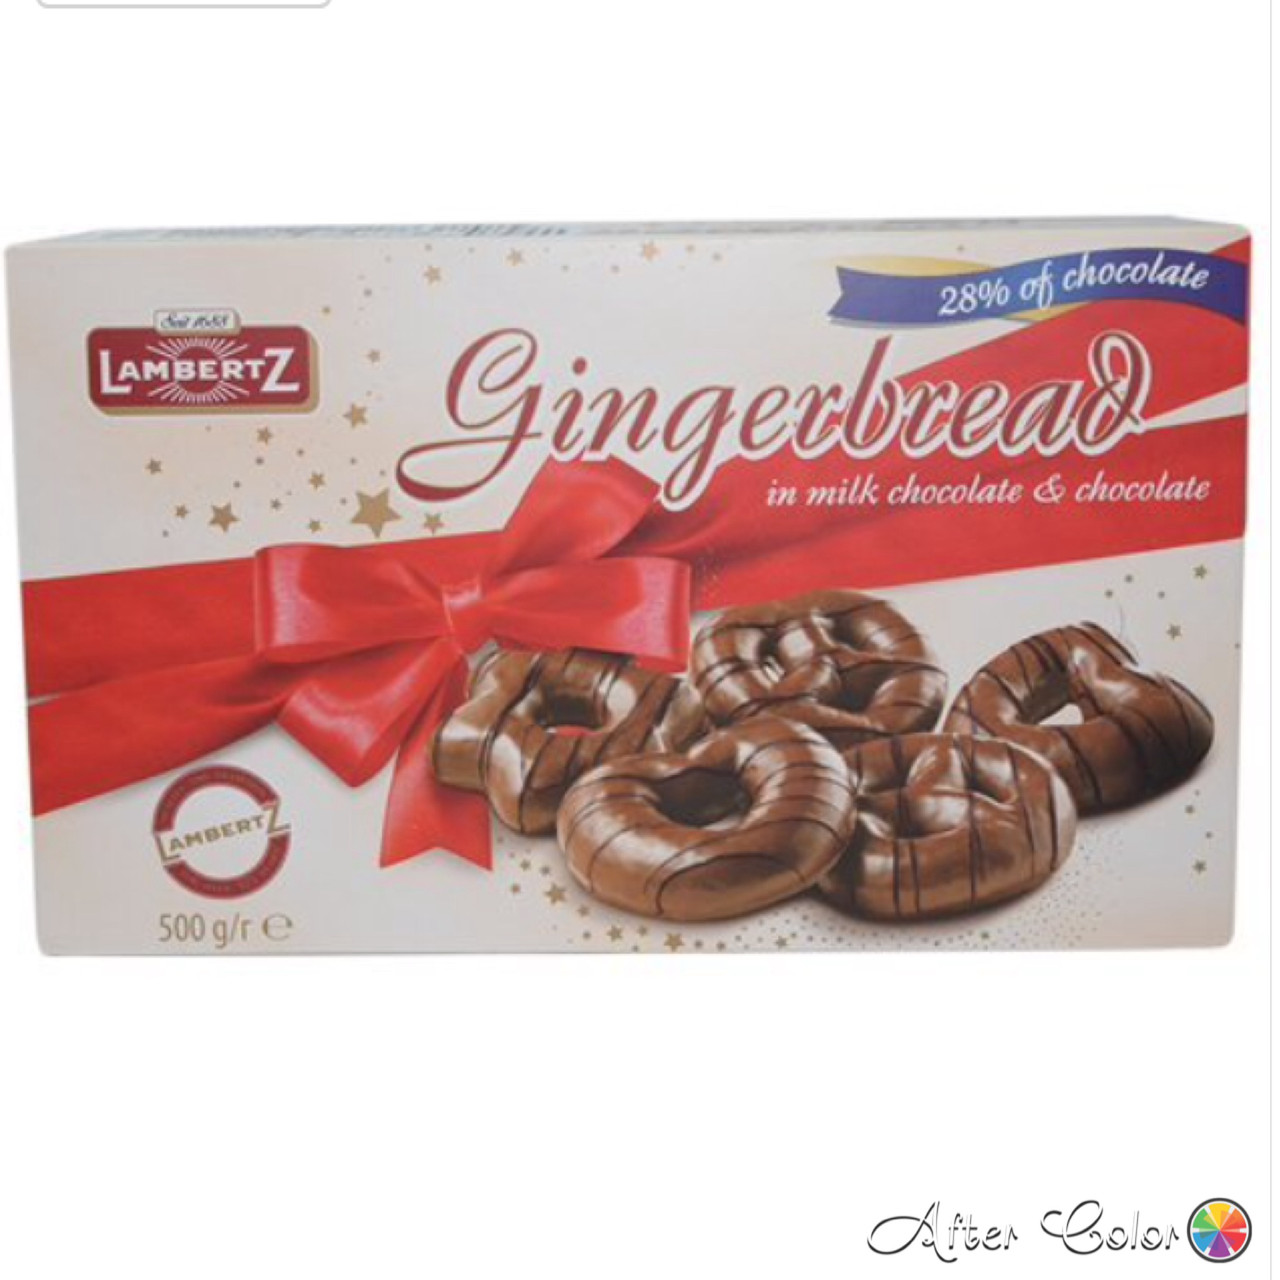 Имбирные пряники Lambertz Gingerbread in Milk Chocolate and Chocolate 500 g